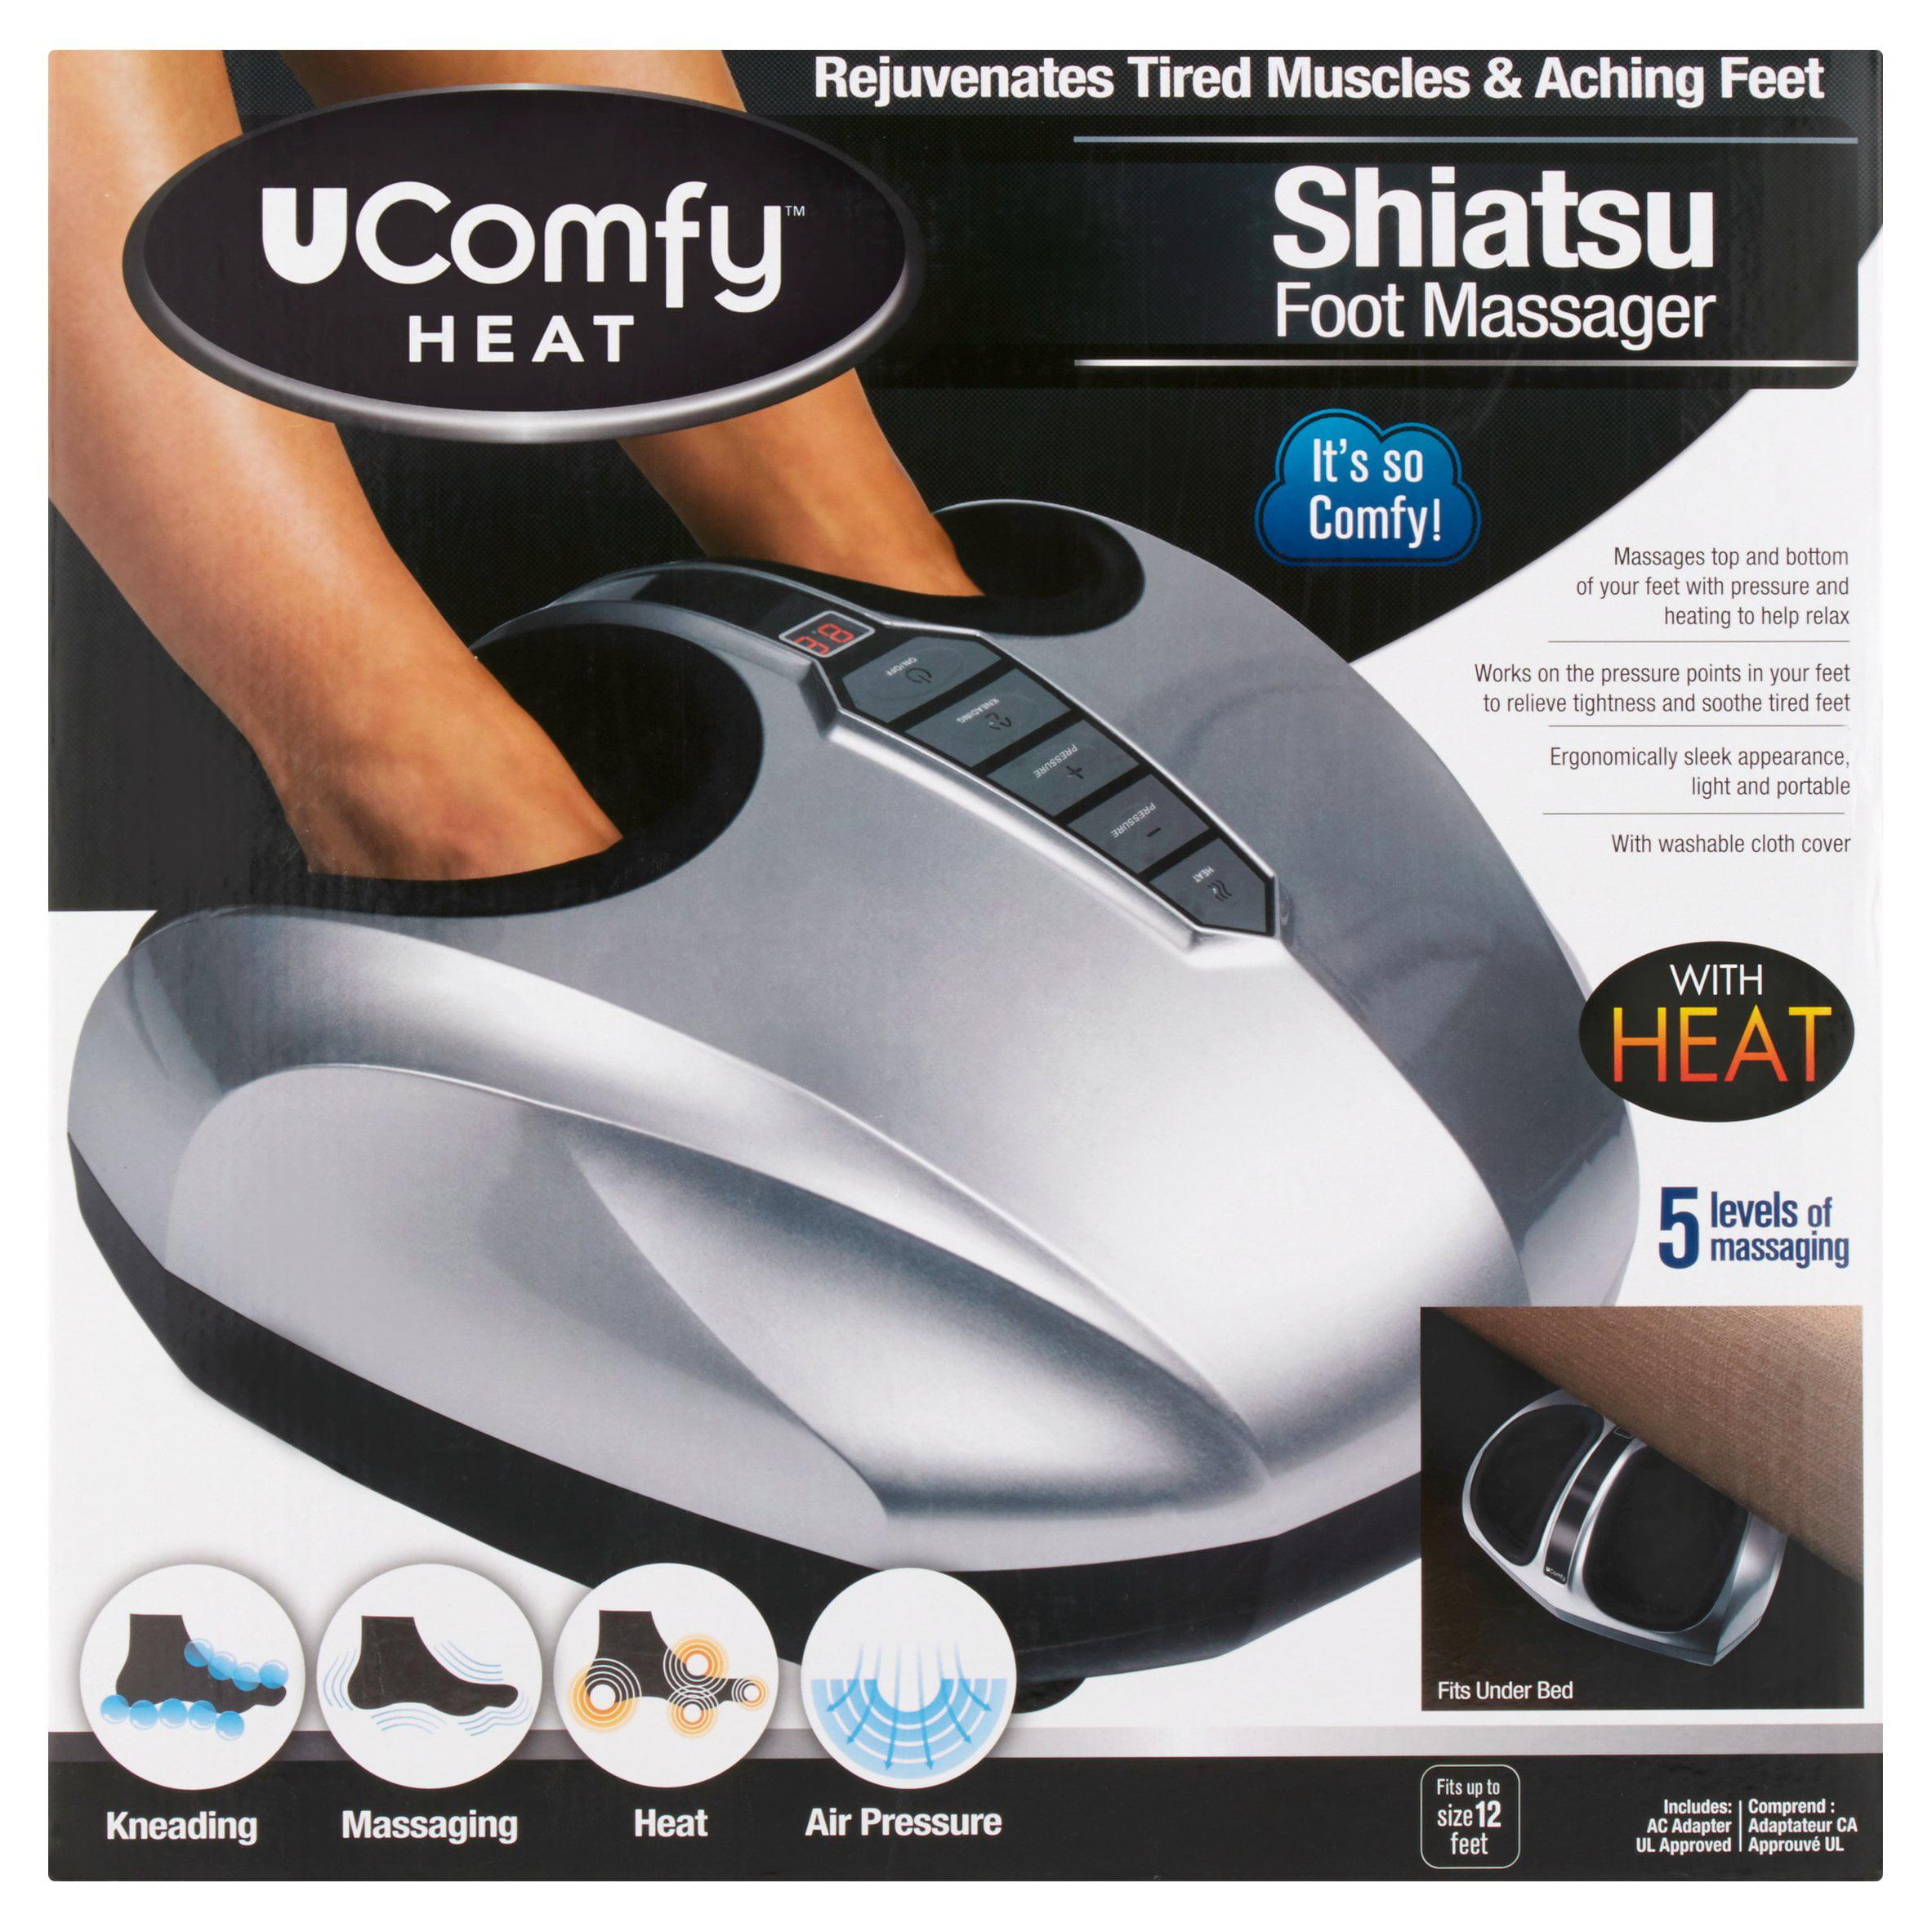 U Comfy Shiatsu Foot Massager with Heat